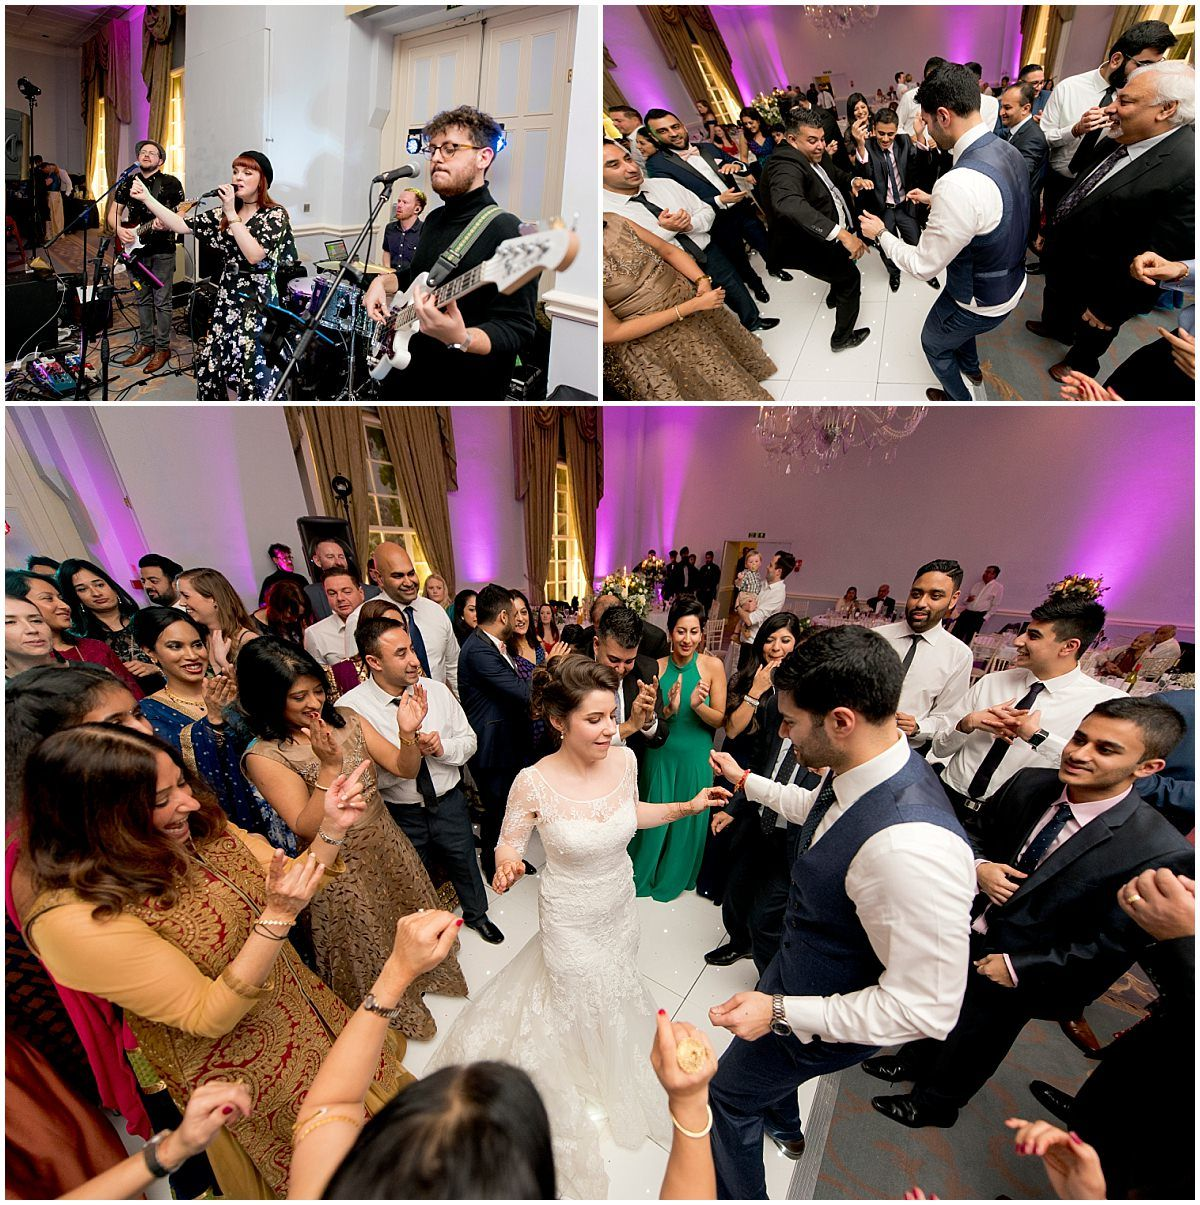 Hindu wedding party